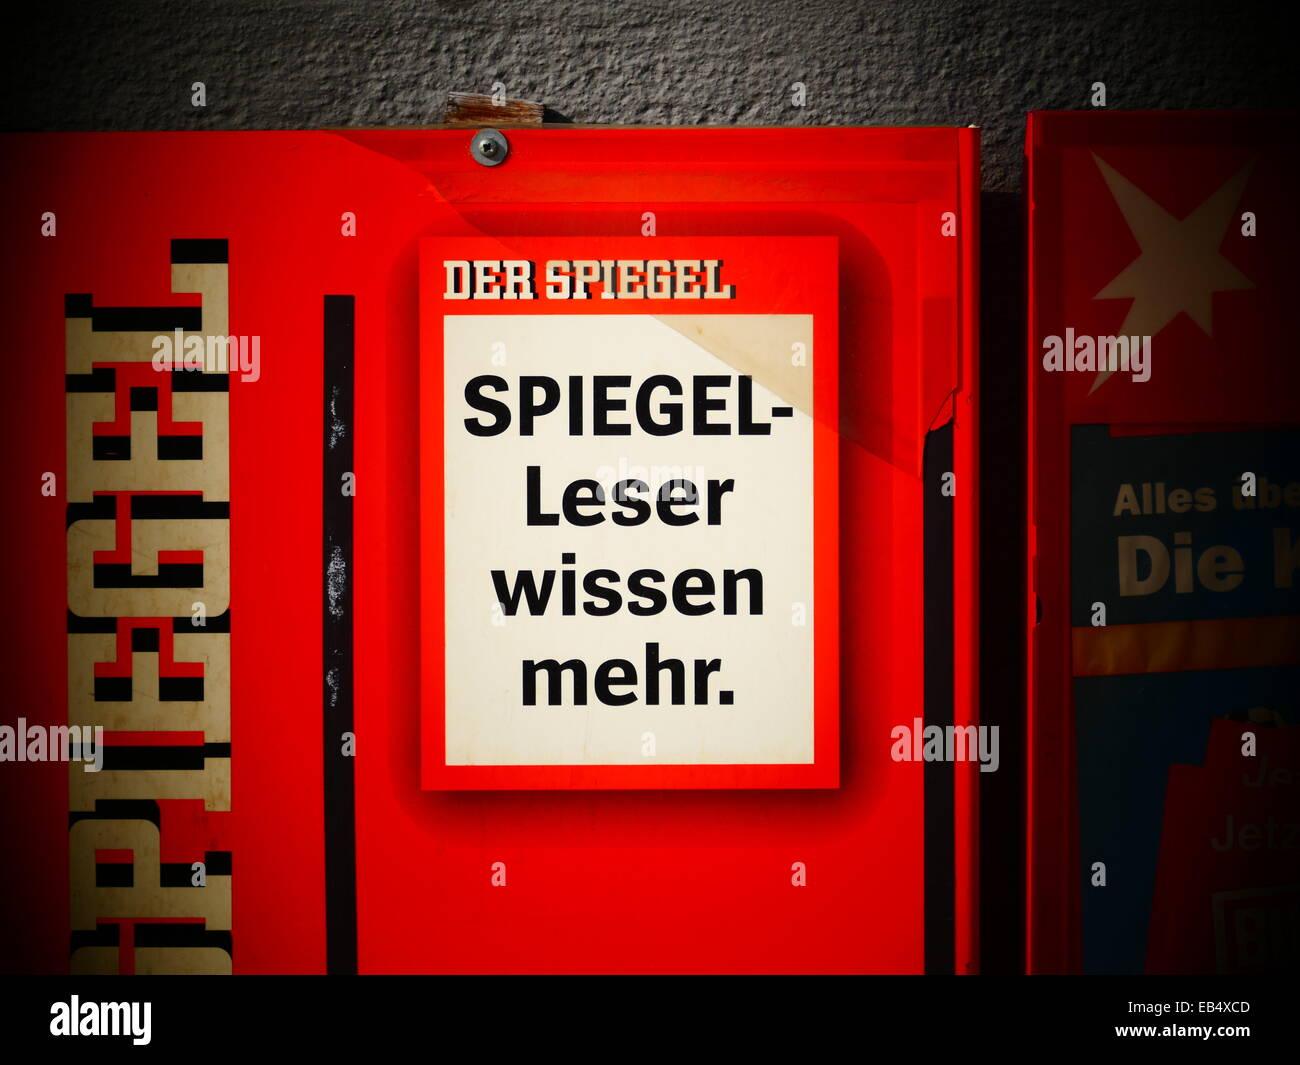 Magazine kiosk stockfotos magazine kiosk bilder alamy for Zeitung der spiegel